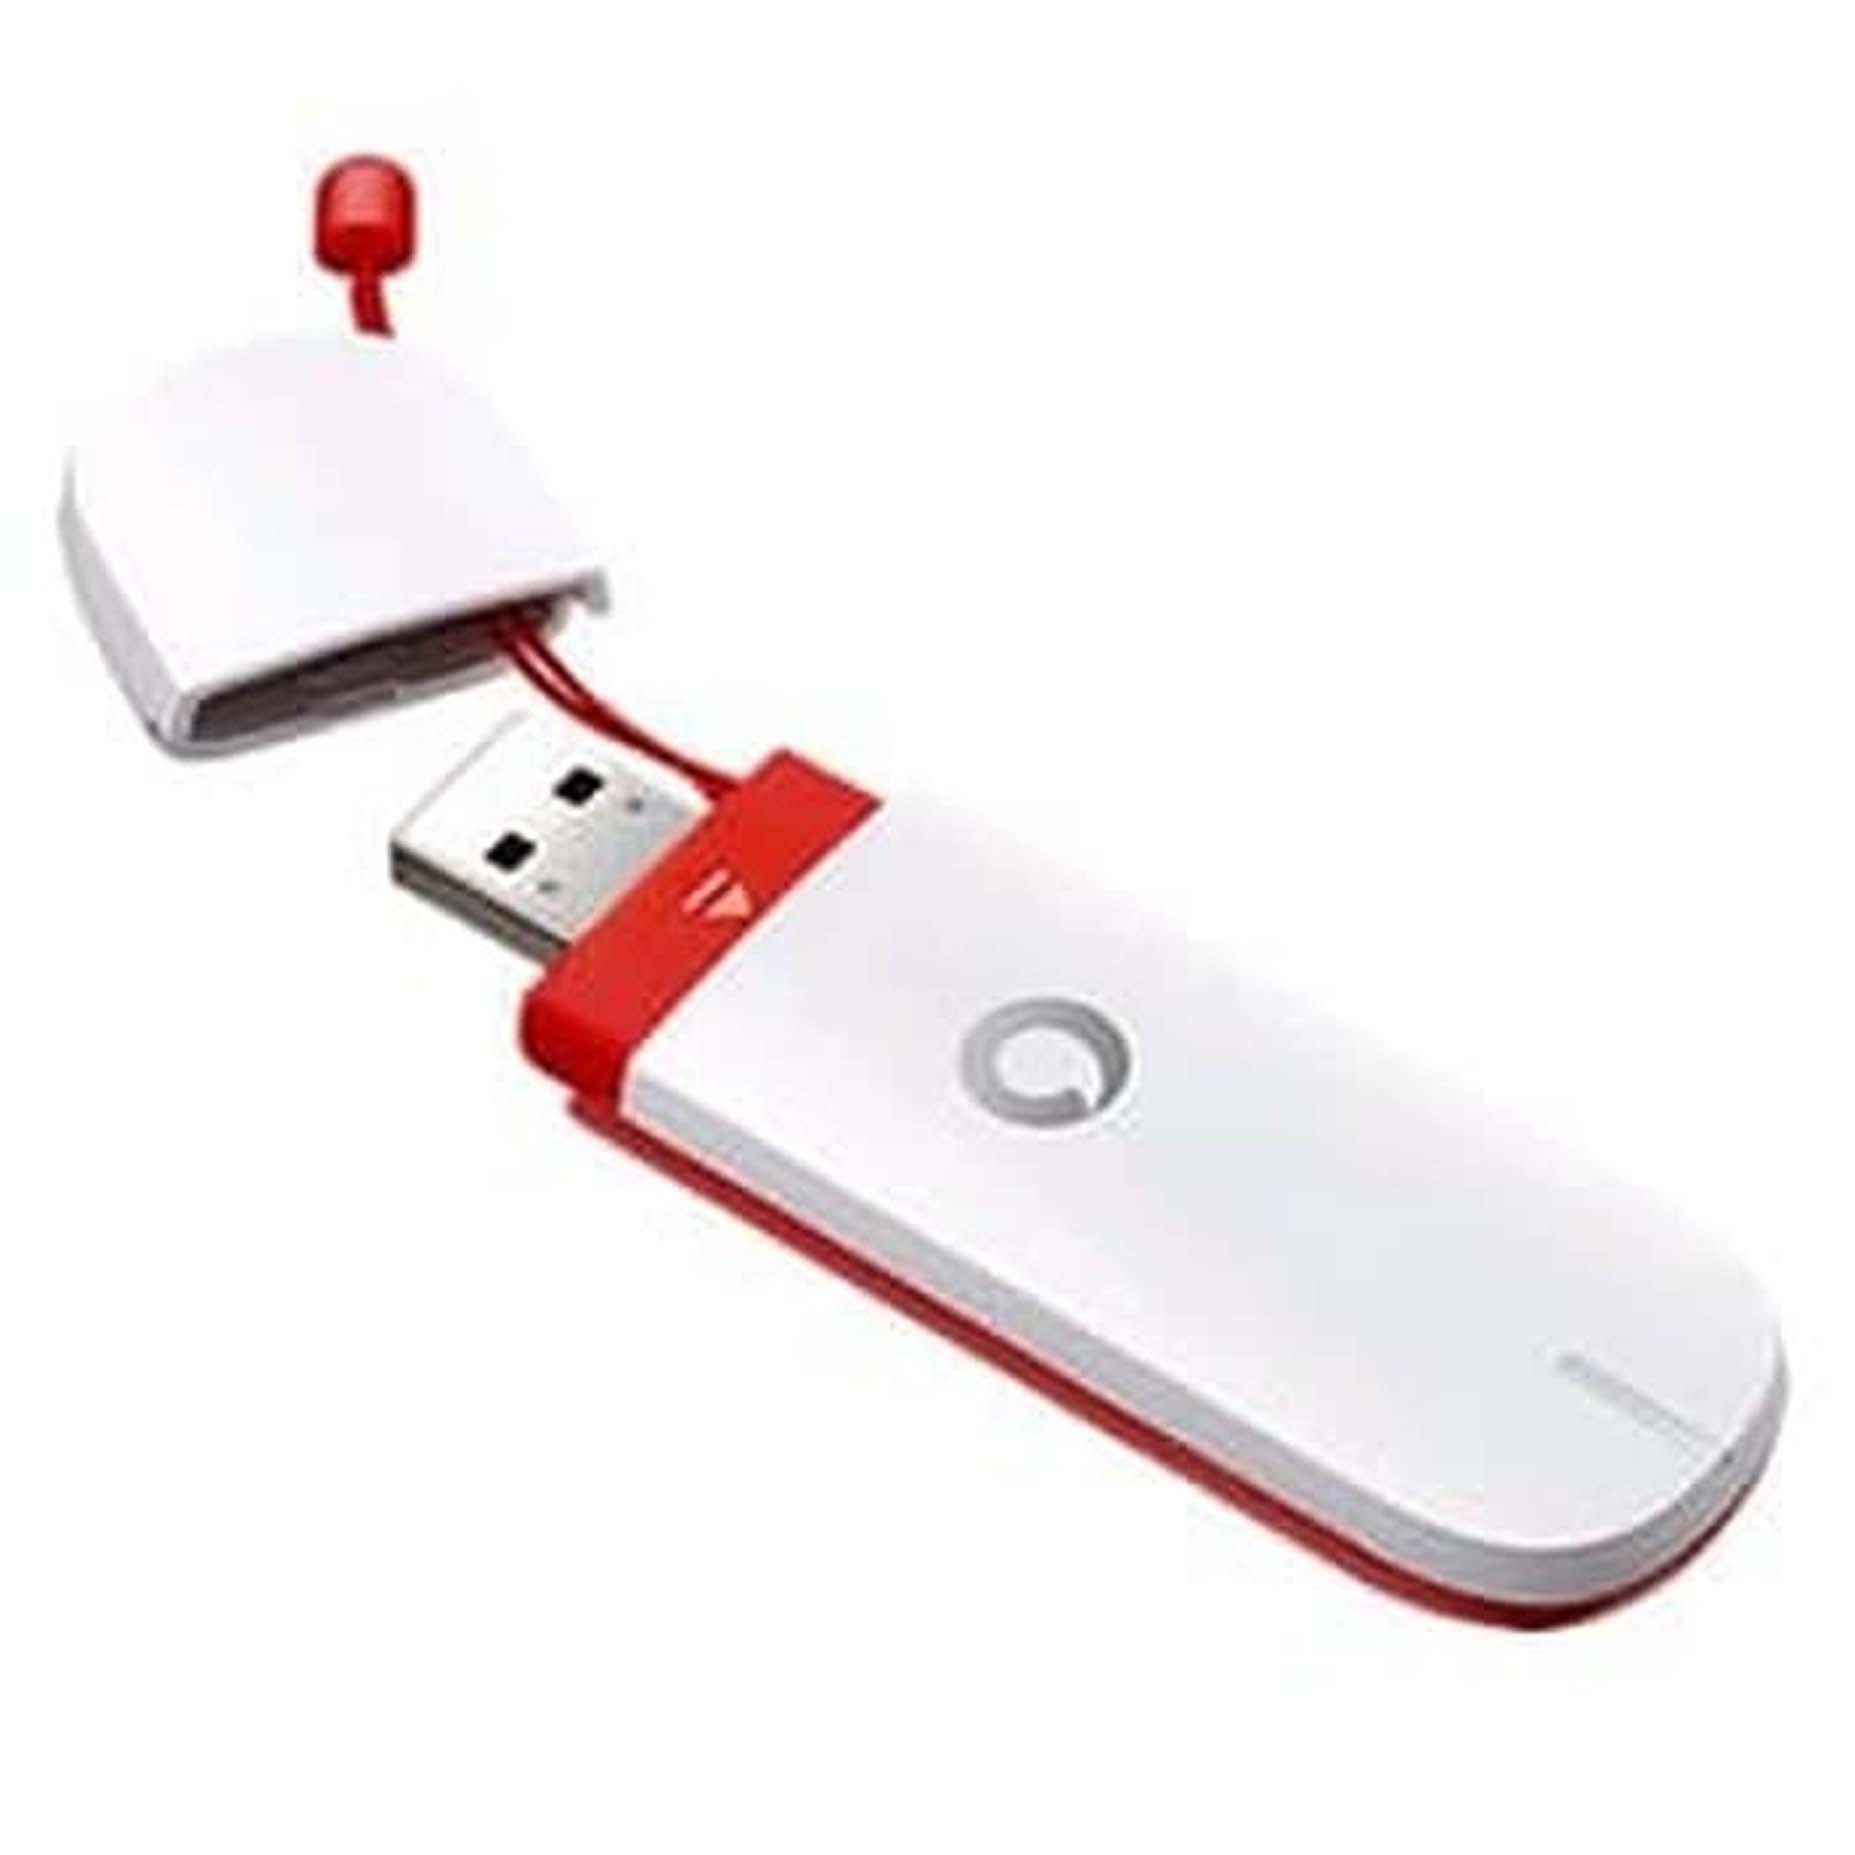 Harga Vodafone ZTE K4201Z 21Mbps HSPA+ Unlock USB Modem